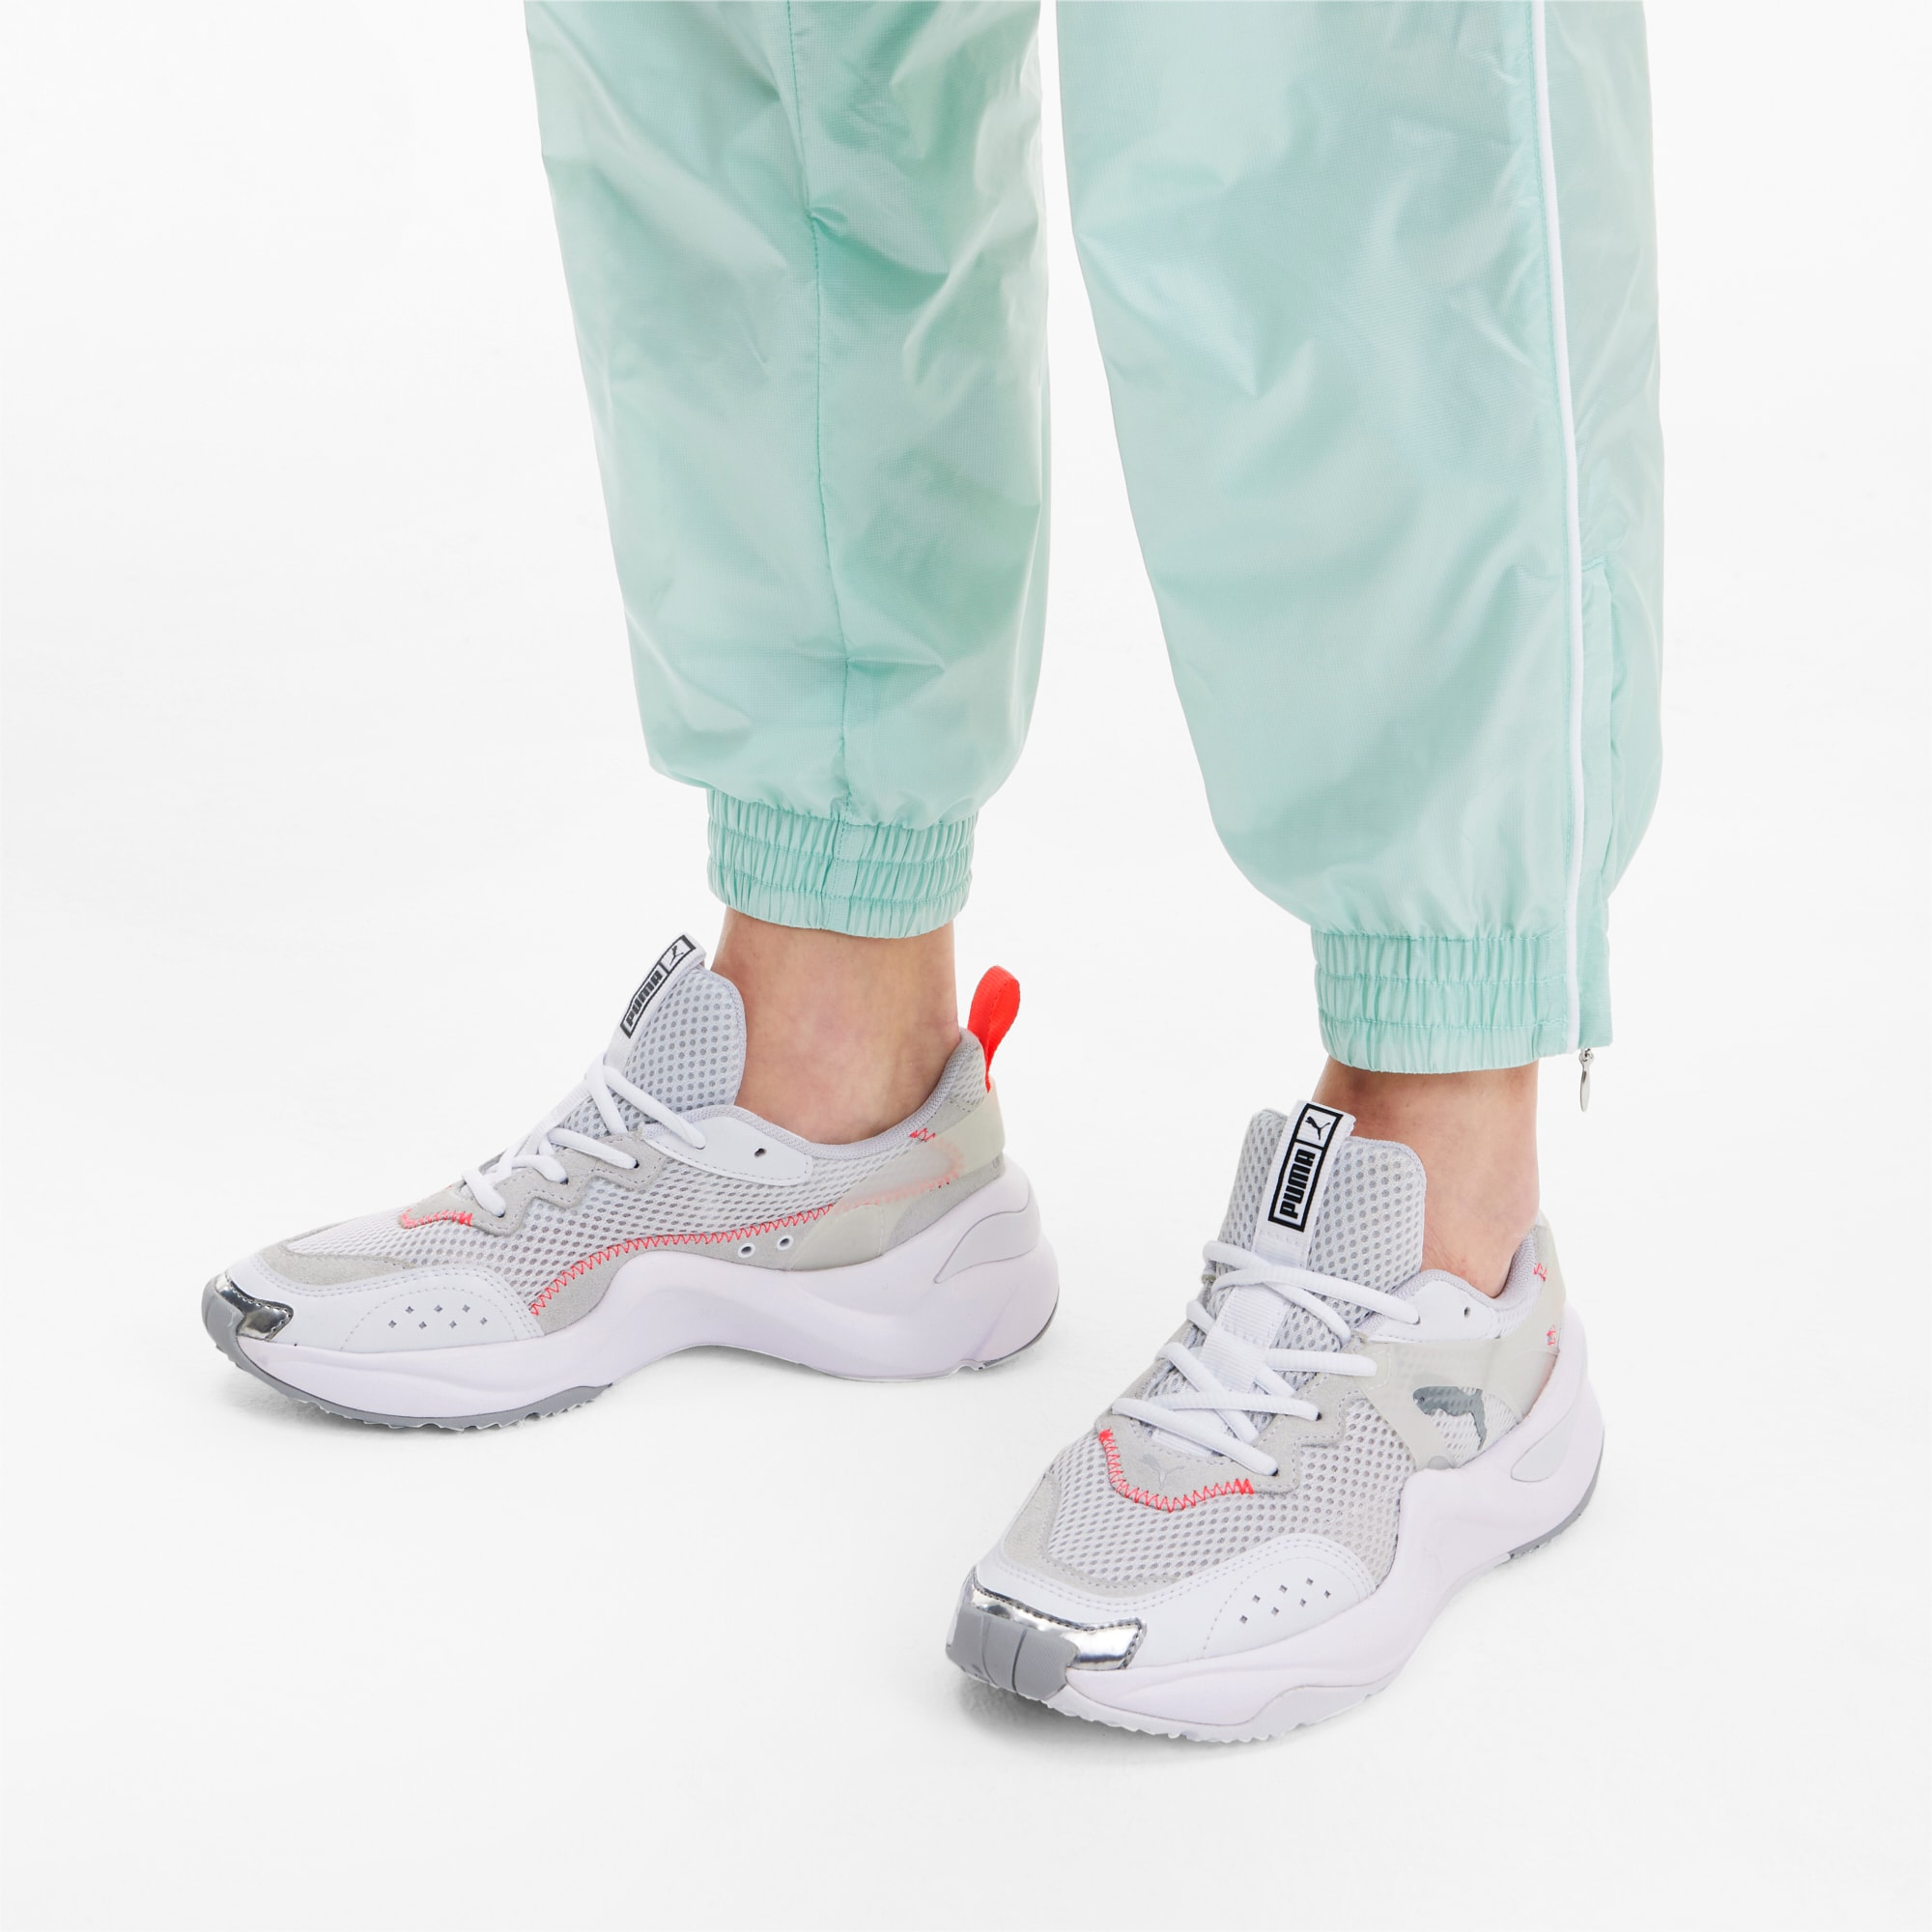 Rise Contrast Women's Sneakers